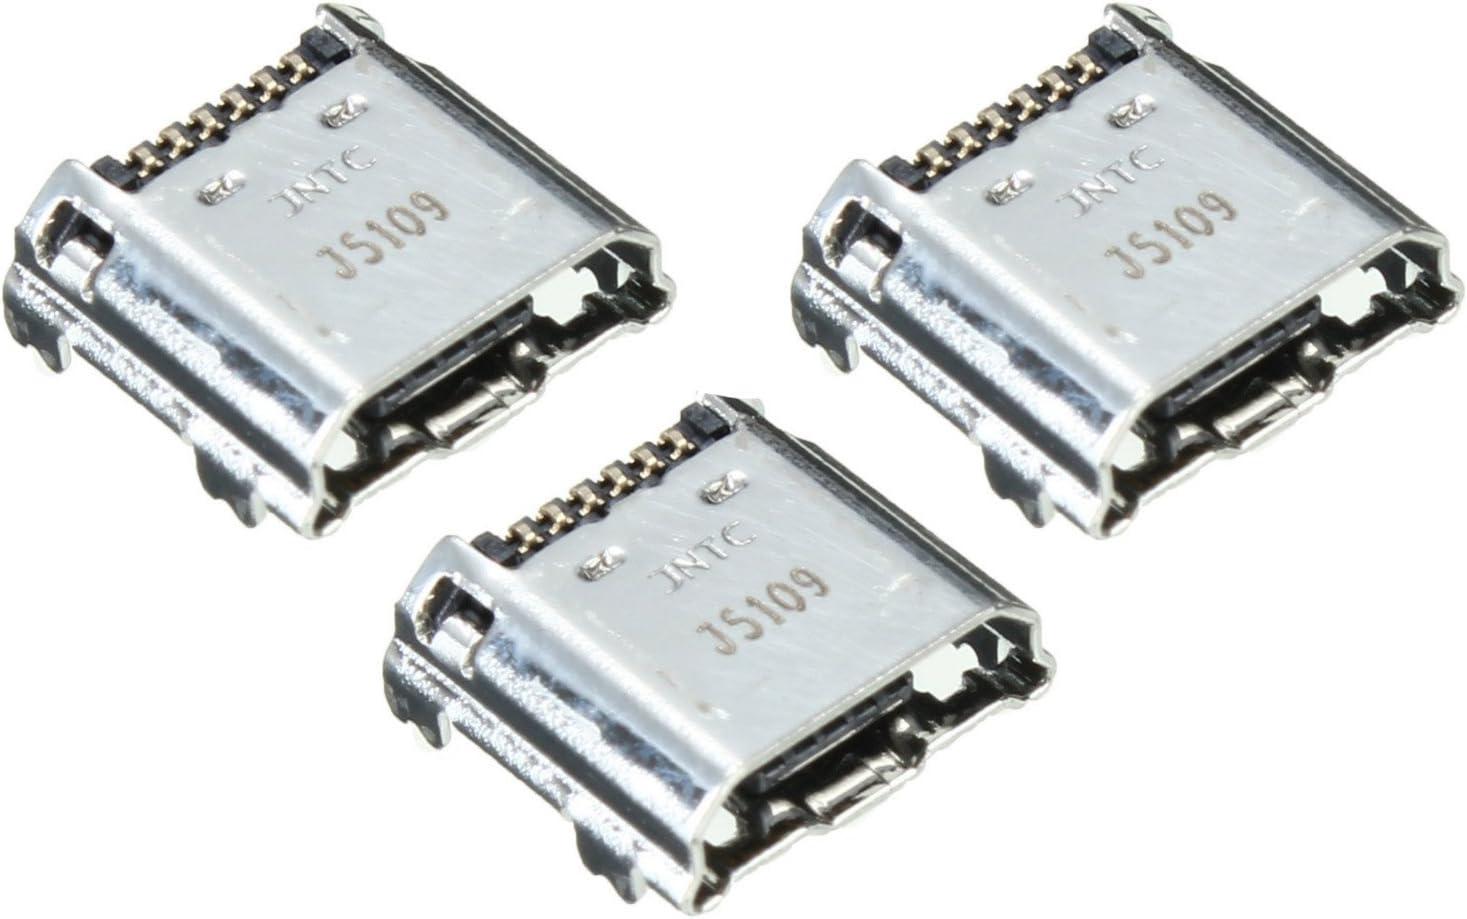 2 X Samsung Galaxy Tab 3 Lite 7.0 SM-T110 T111 Charging Port Connector Dock USB